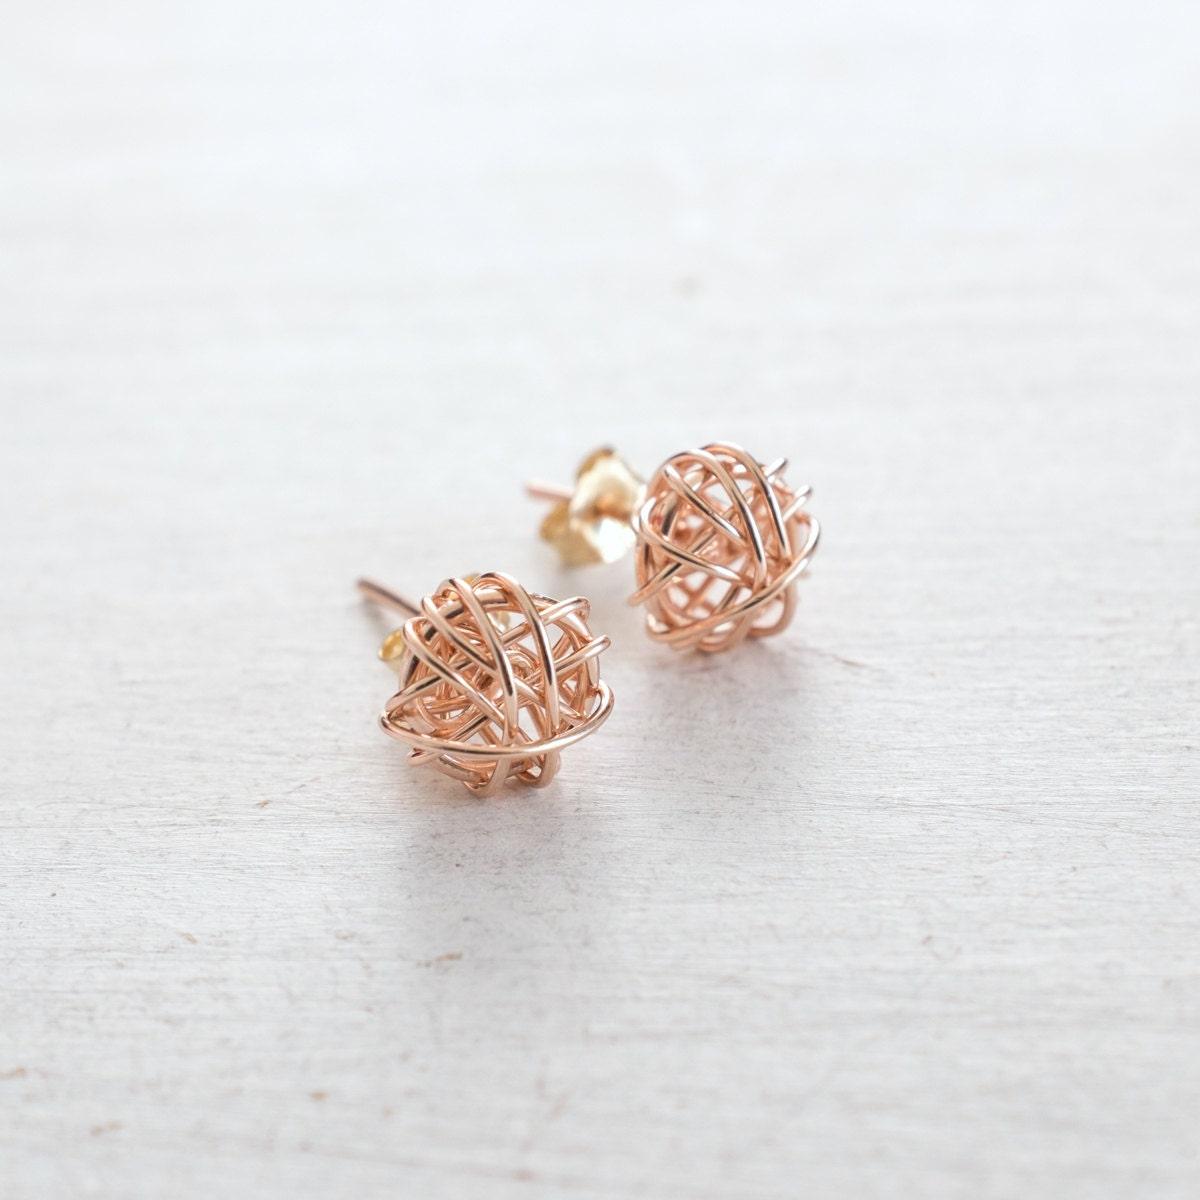 rose gold stud earrings rose gold or silver gold earrings. Black Bedroom Furniture Sets. Home Design Ideas